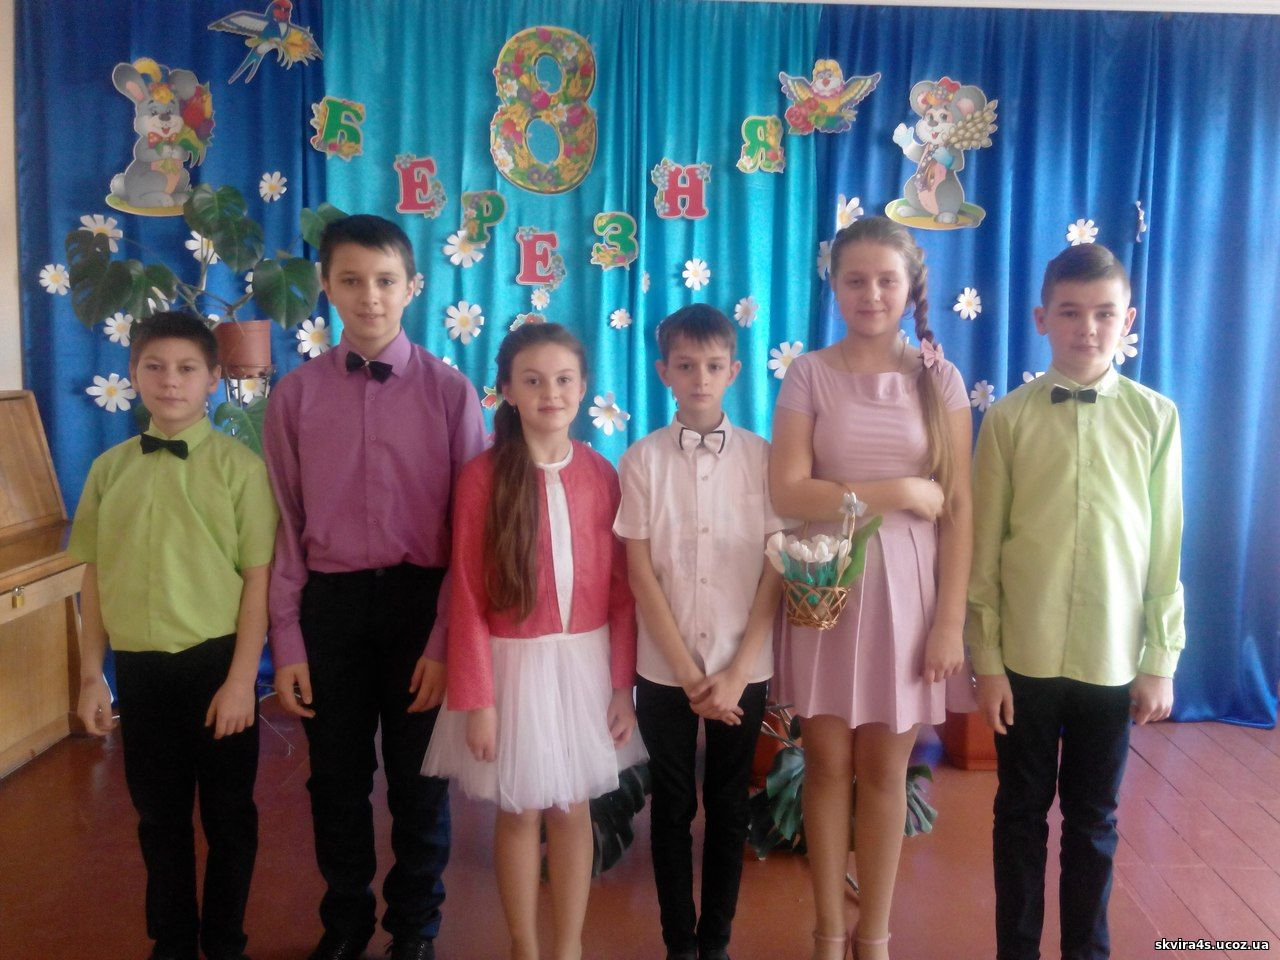 http://skvira4s.ucoz.ua/foto/08-03linijka/rMDnDslDm34.jpg